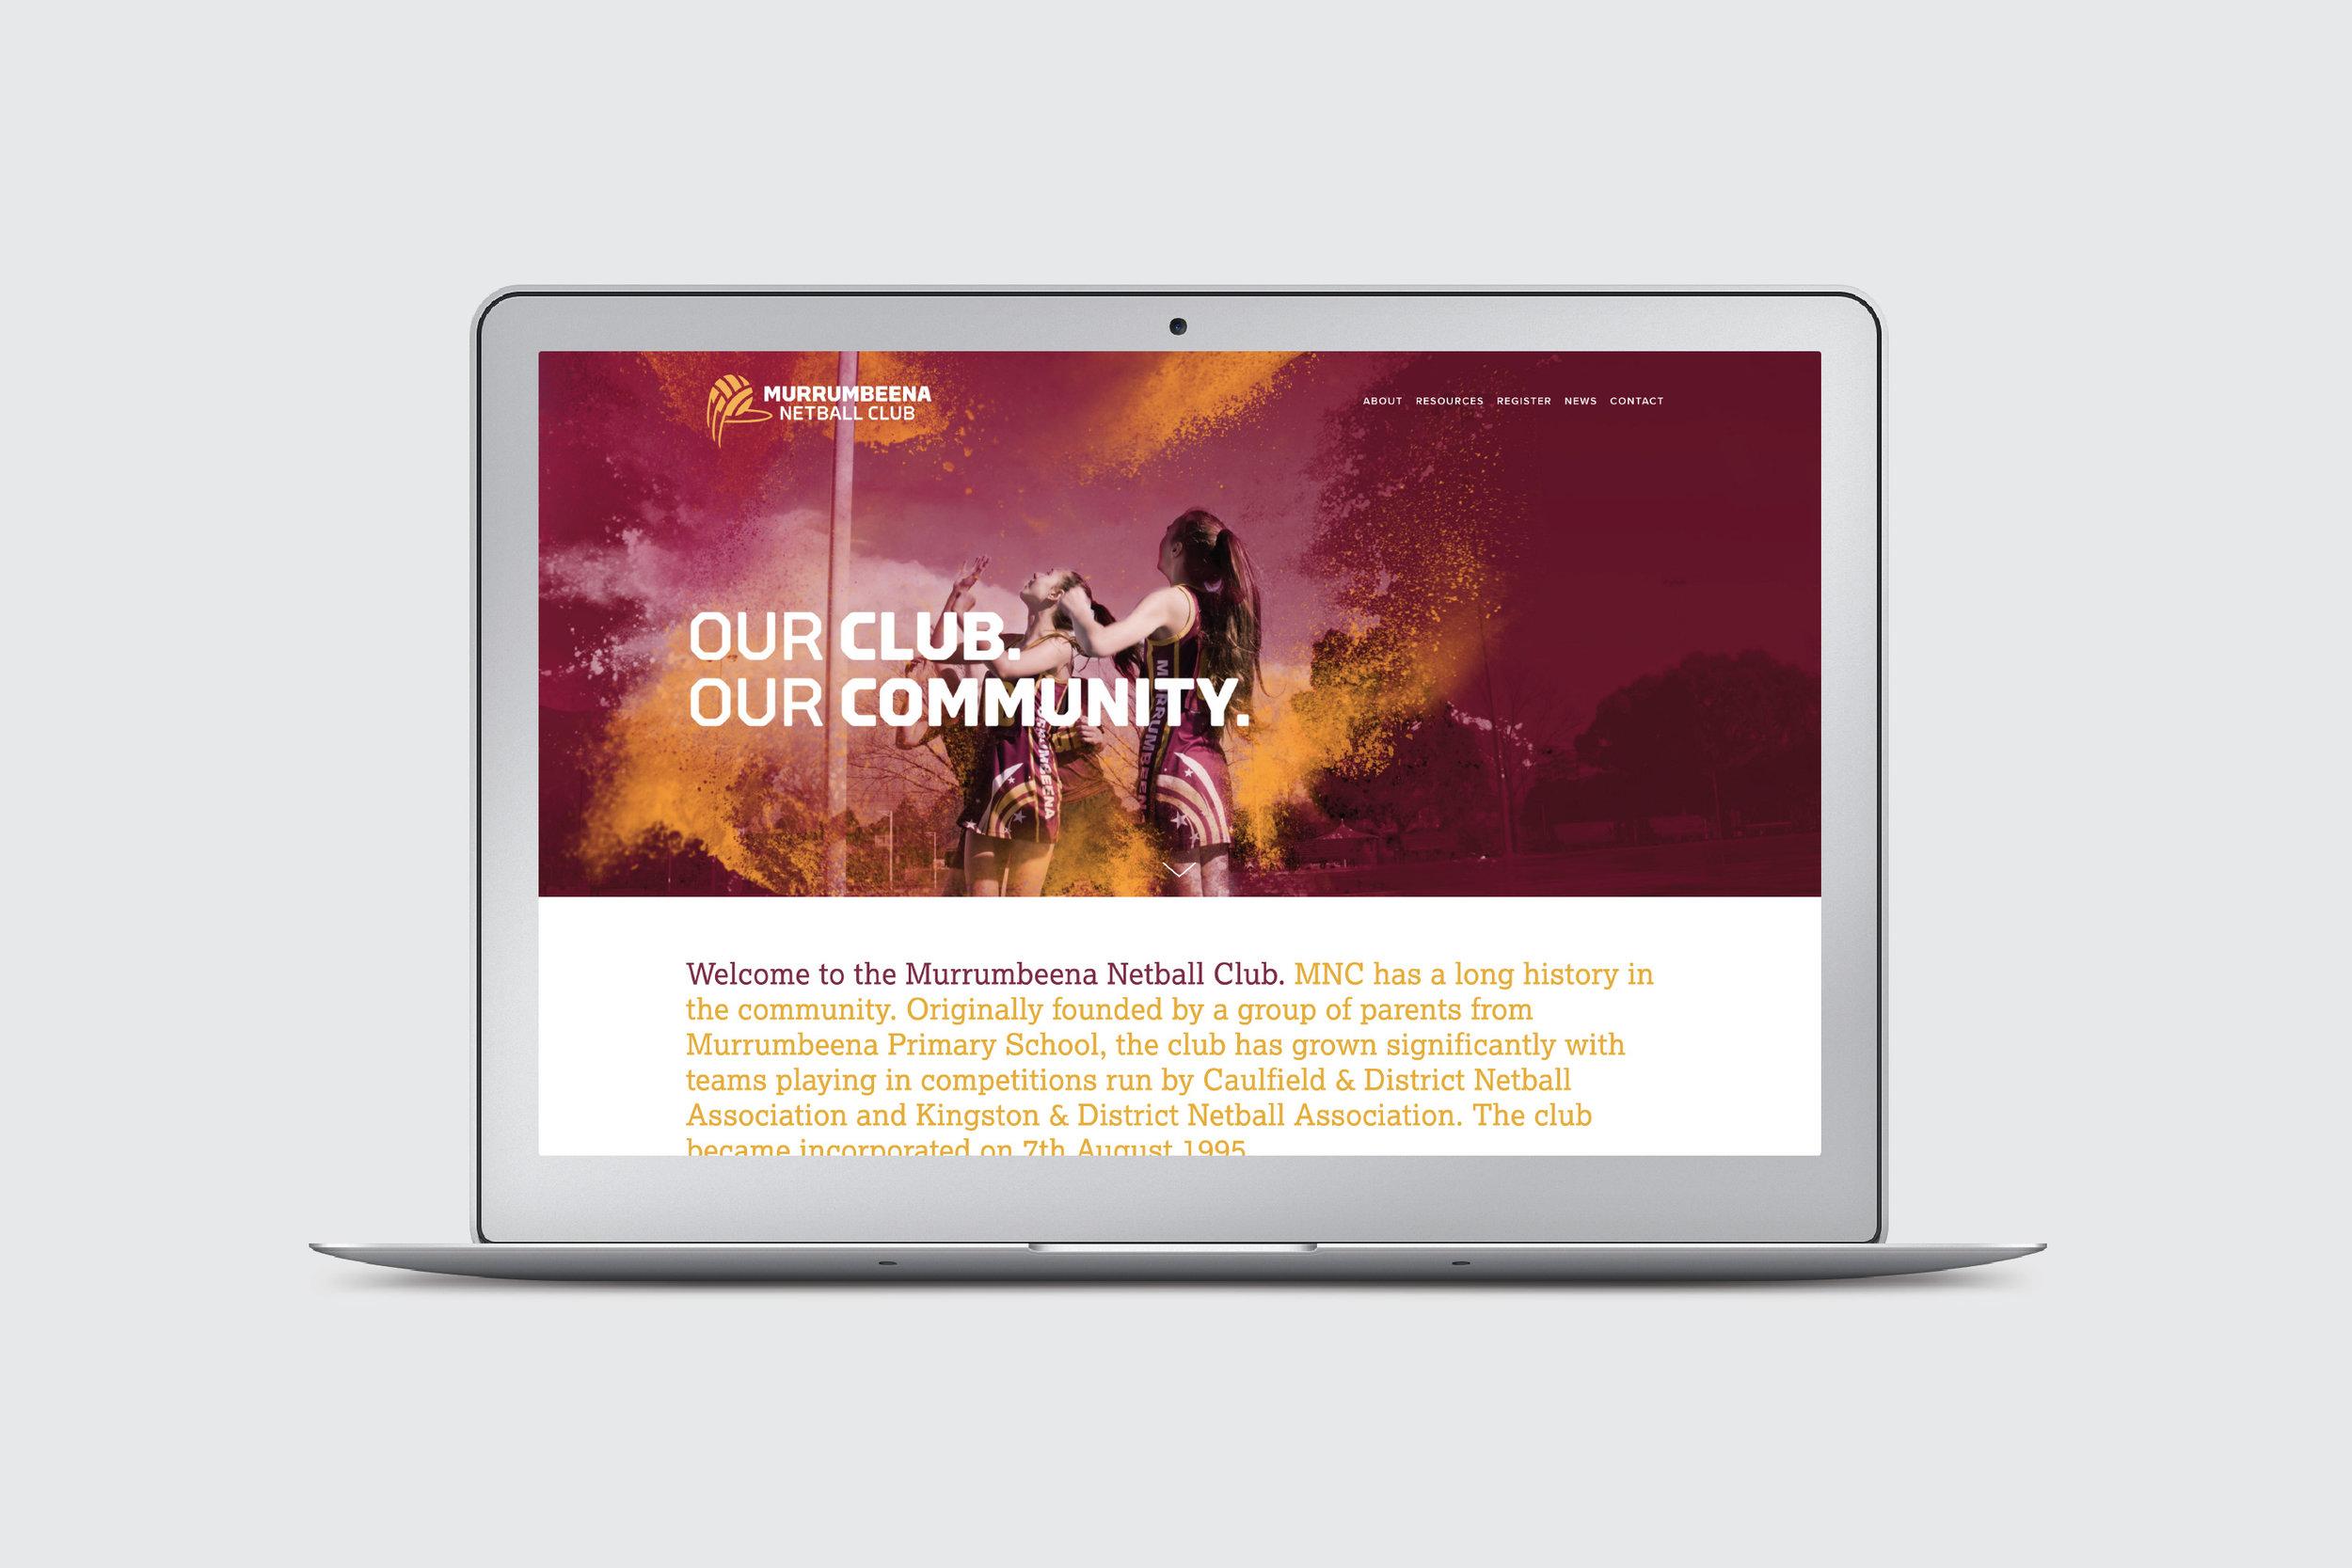 Murrumbeena Netball Club - Branding, Online, Apparel, Collateral